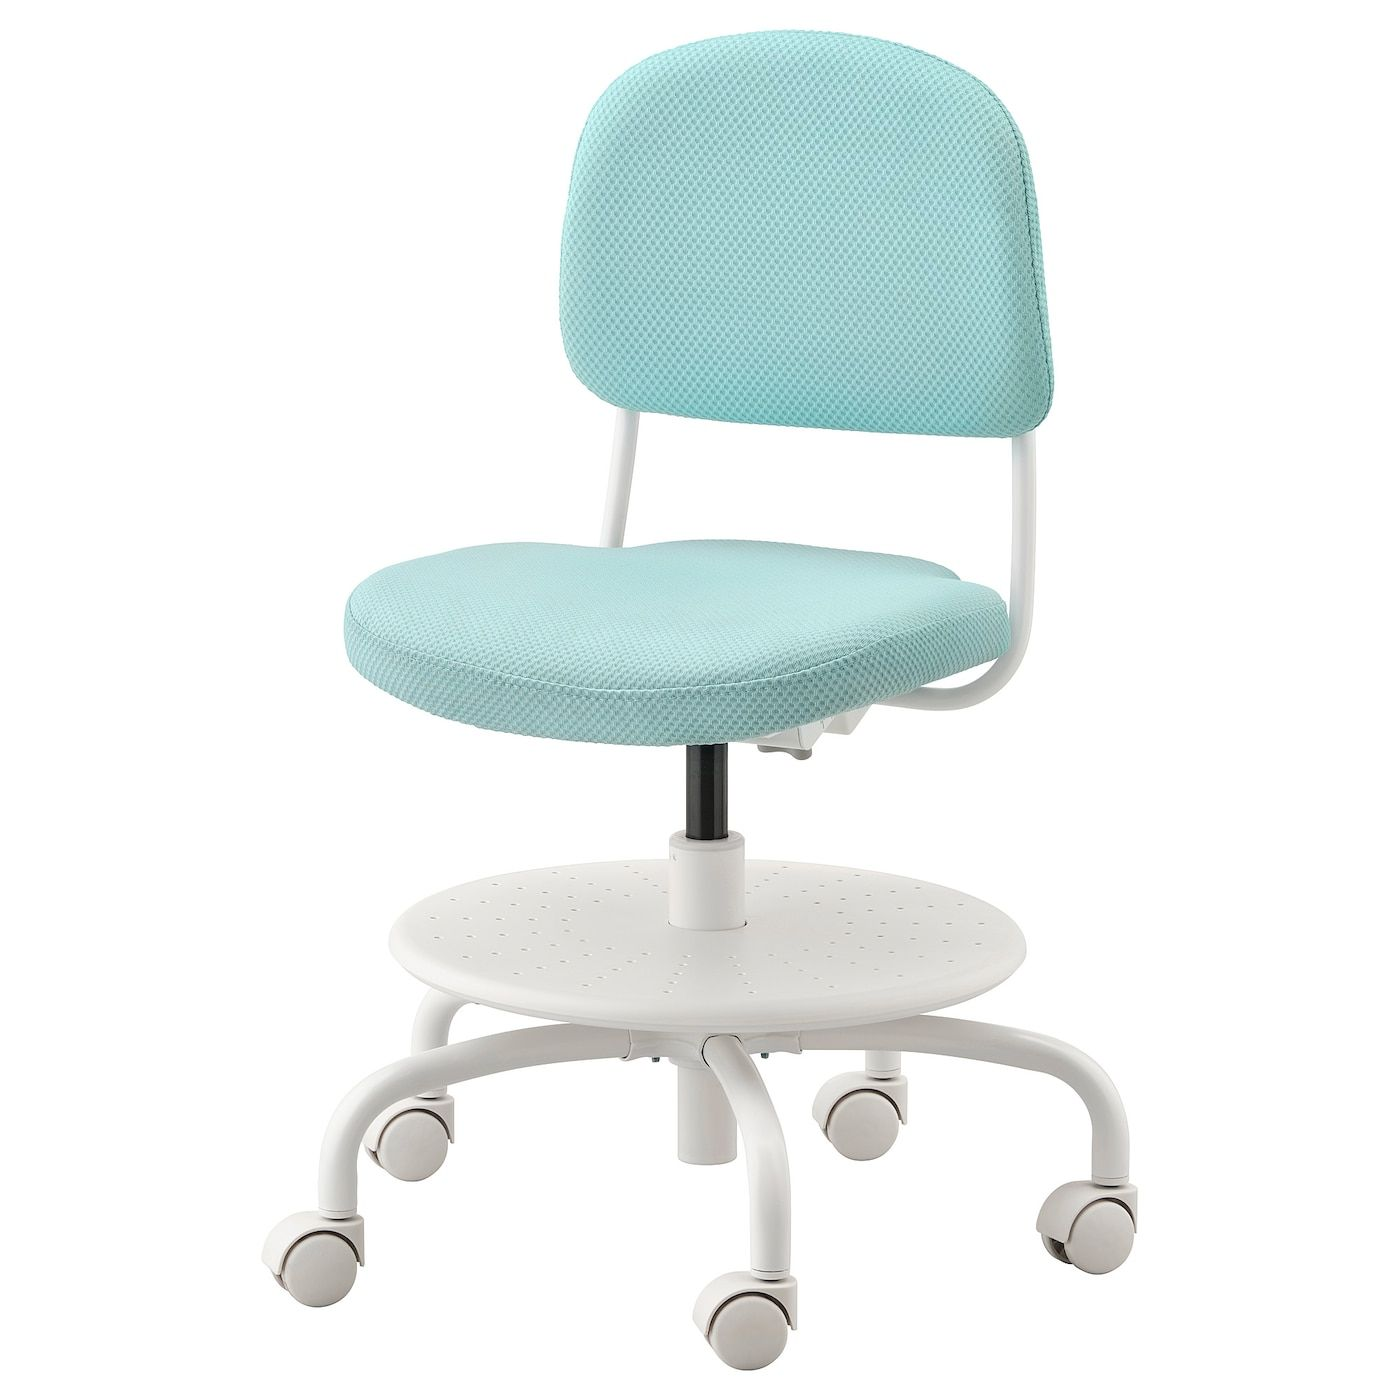 Ikea Vimund Child S Desk Chair Light Turquoise